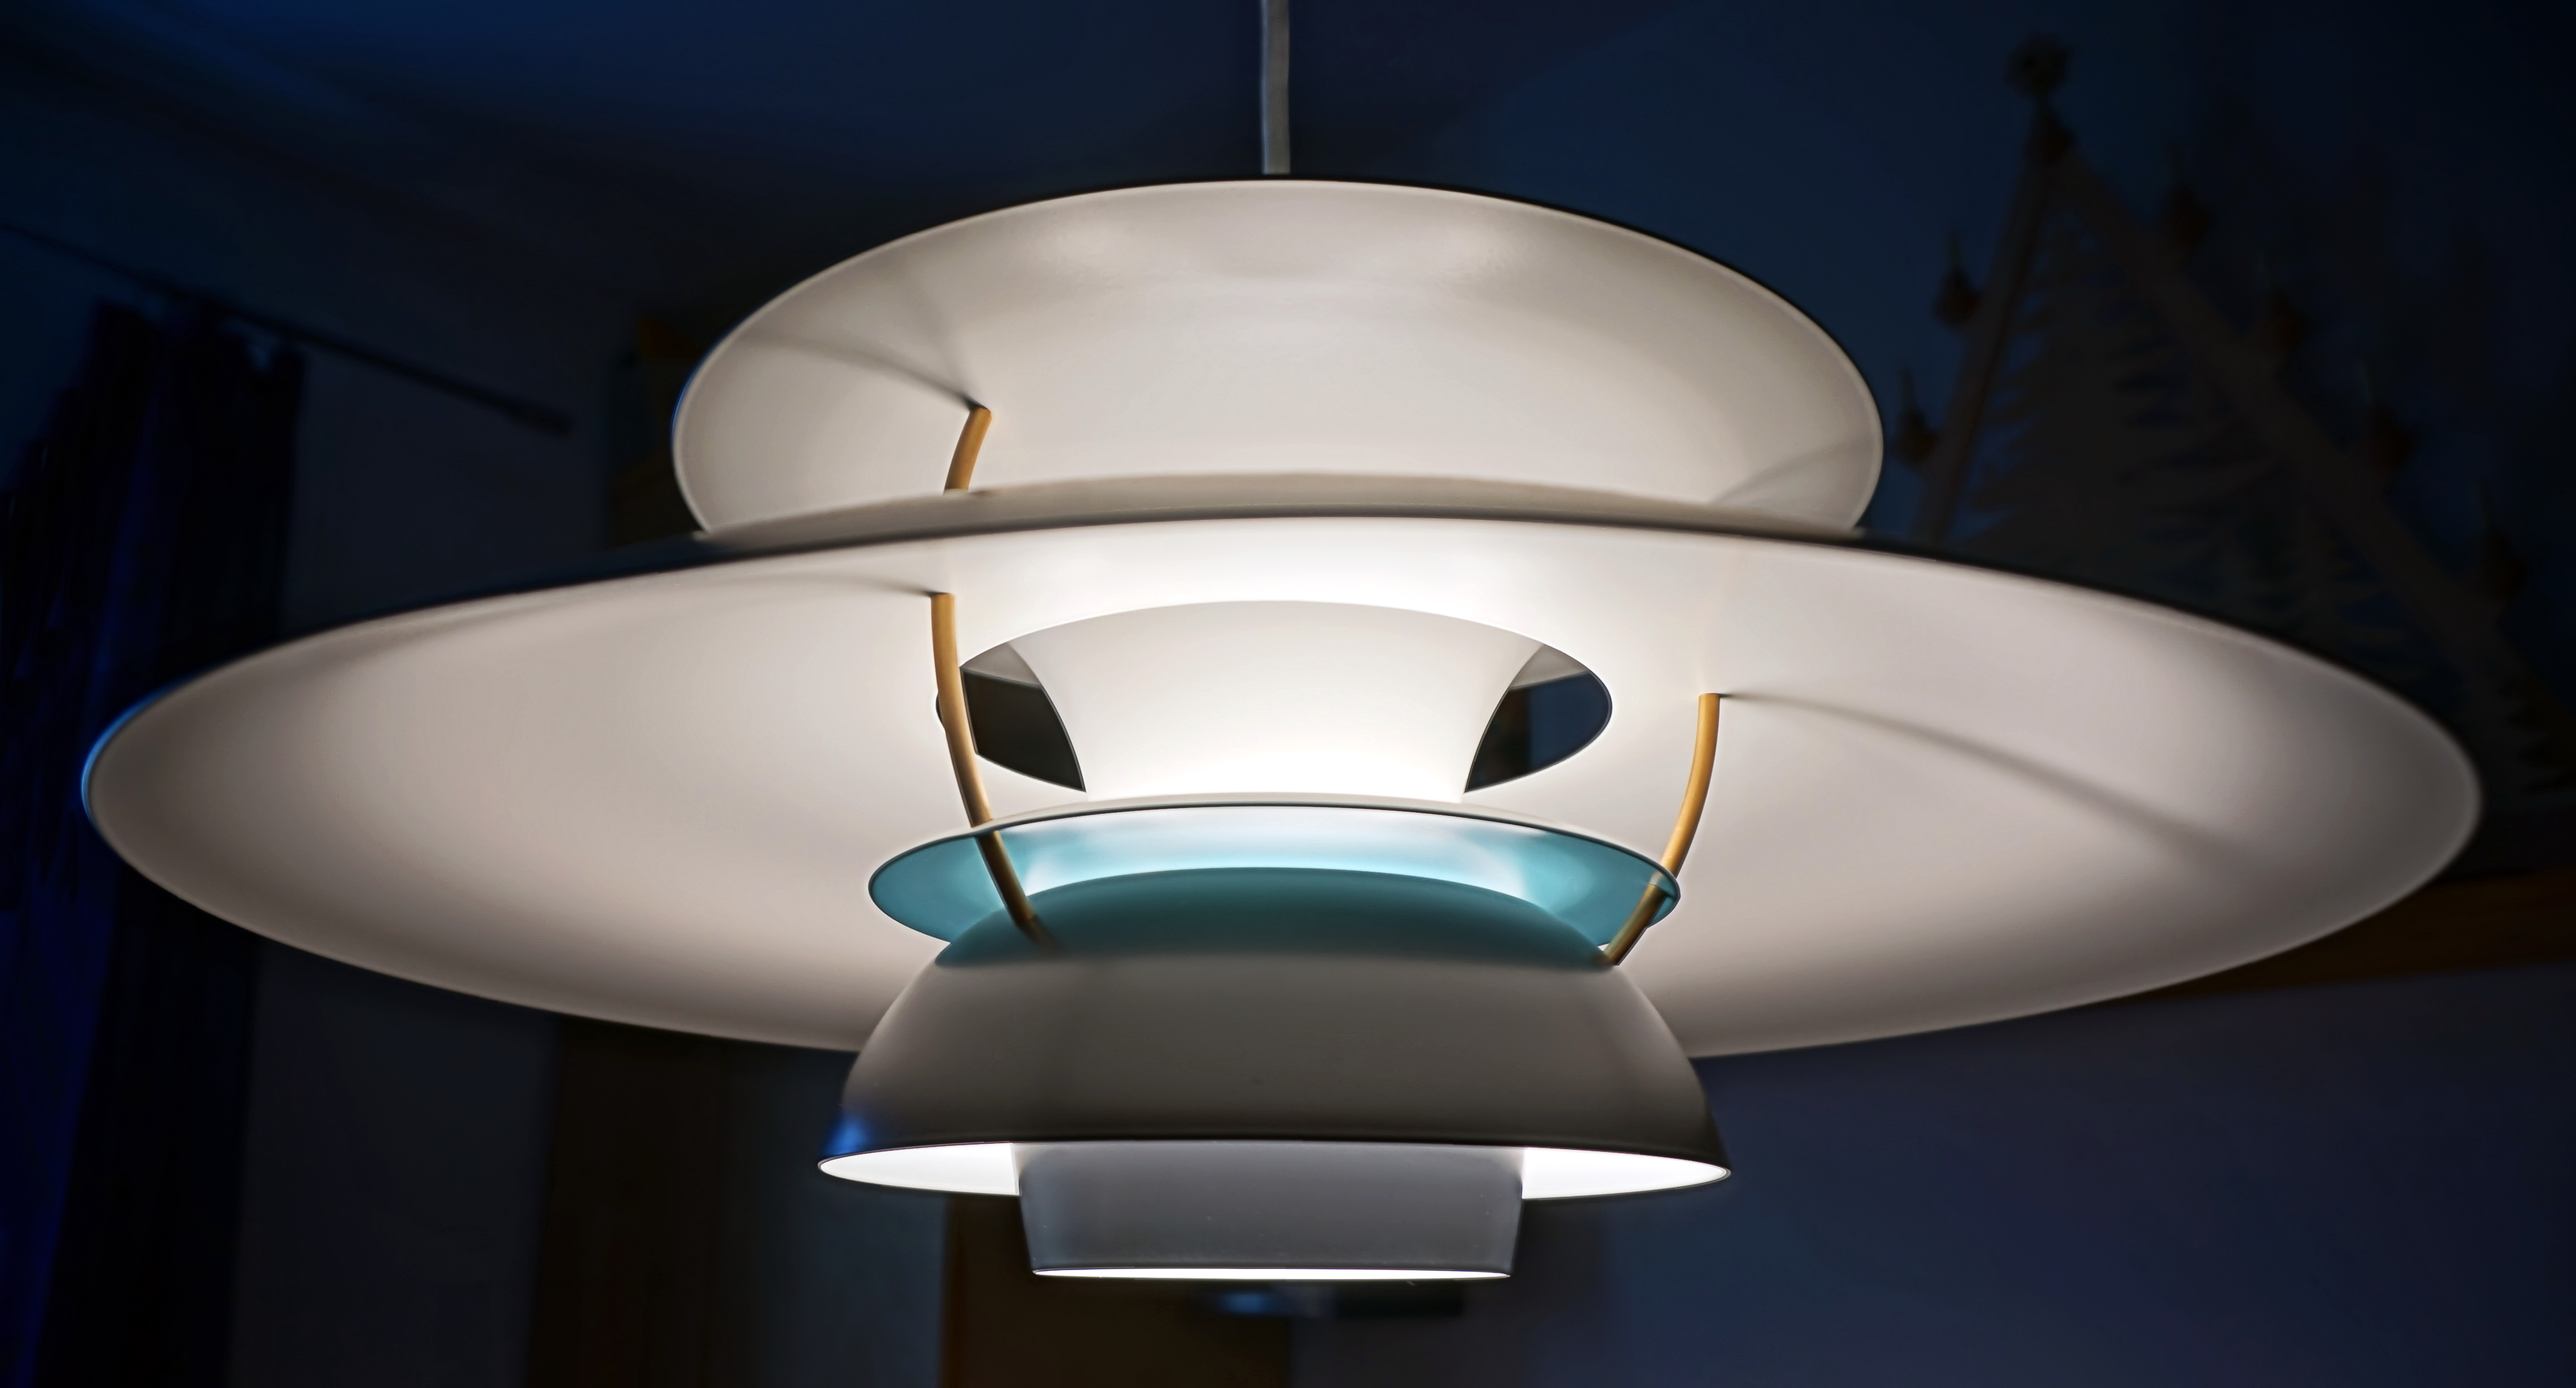 file louis poulsen ph5 poul wikimedia commons. Black Bedroom Furniture Sets. Home Design Ideas